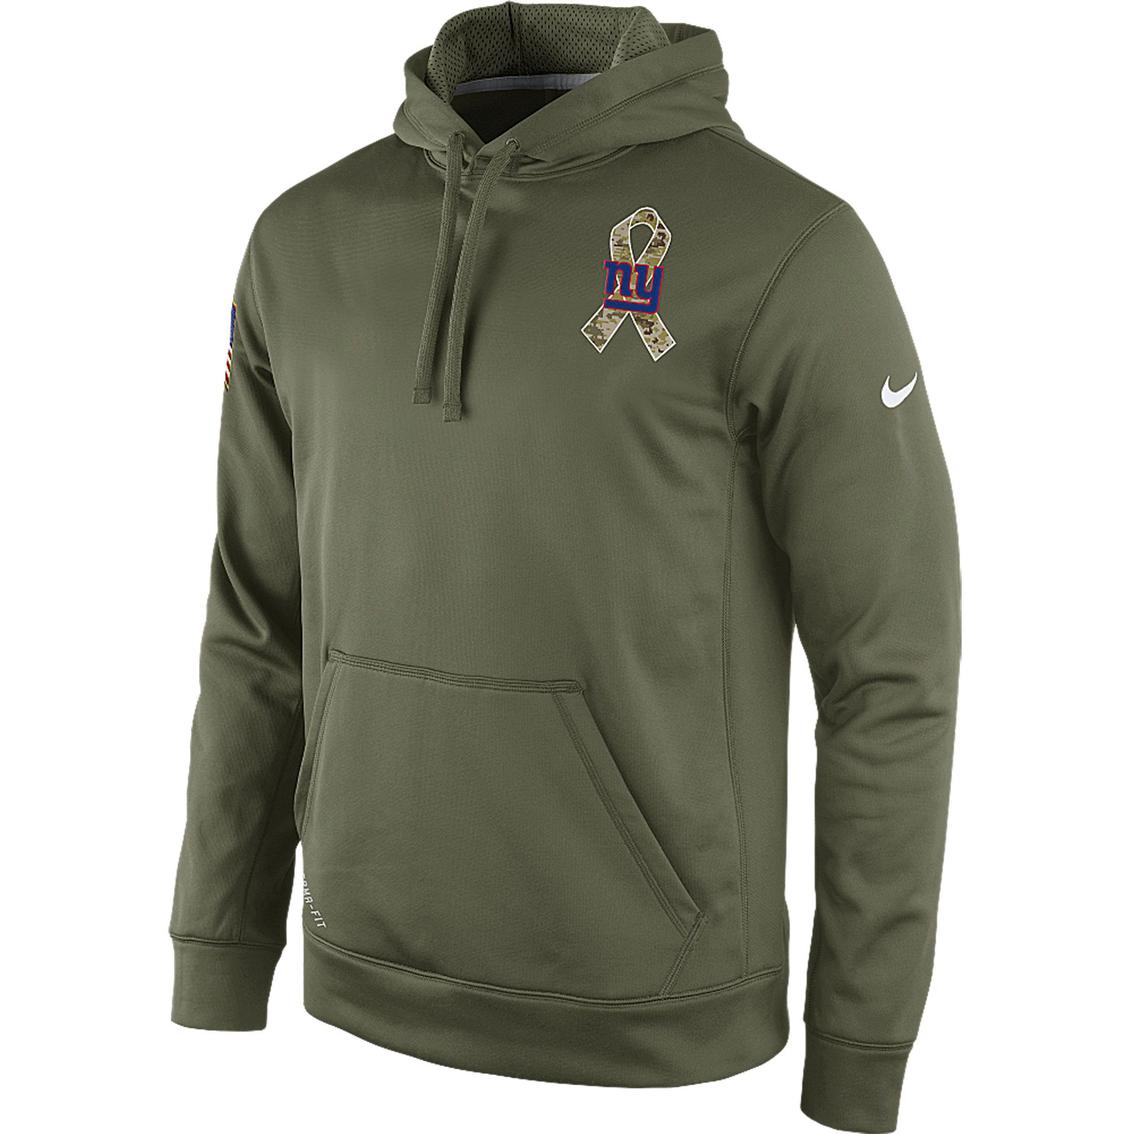 Nike Nfl New York Giants Salute To Service Ko Hoodie